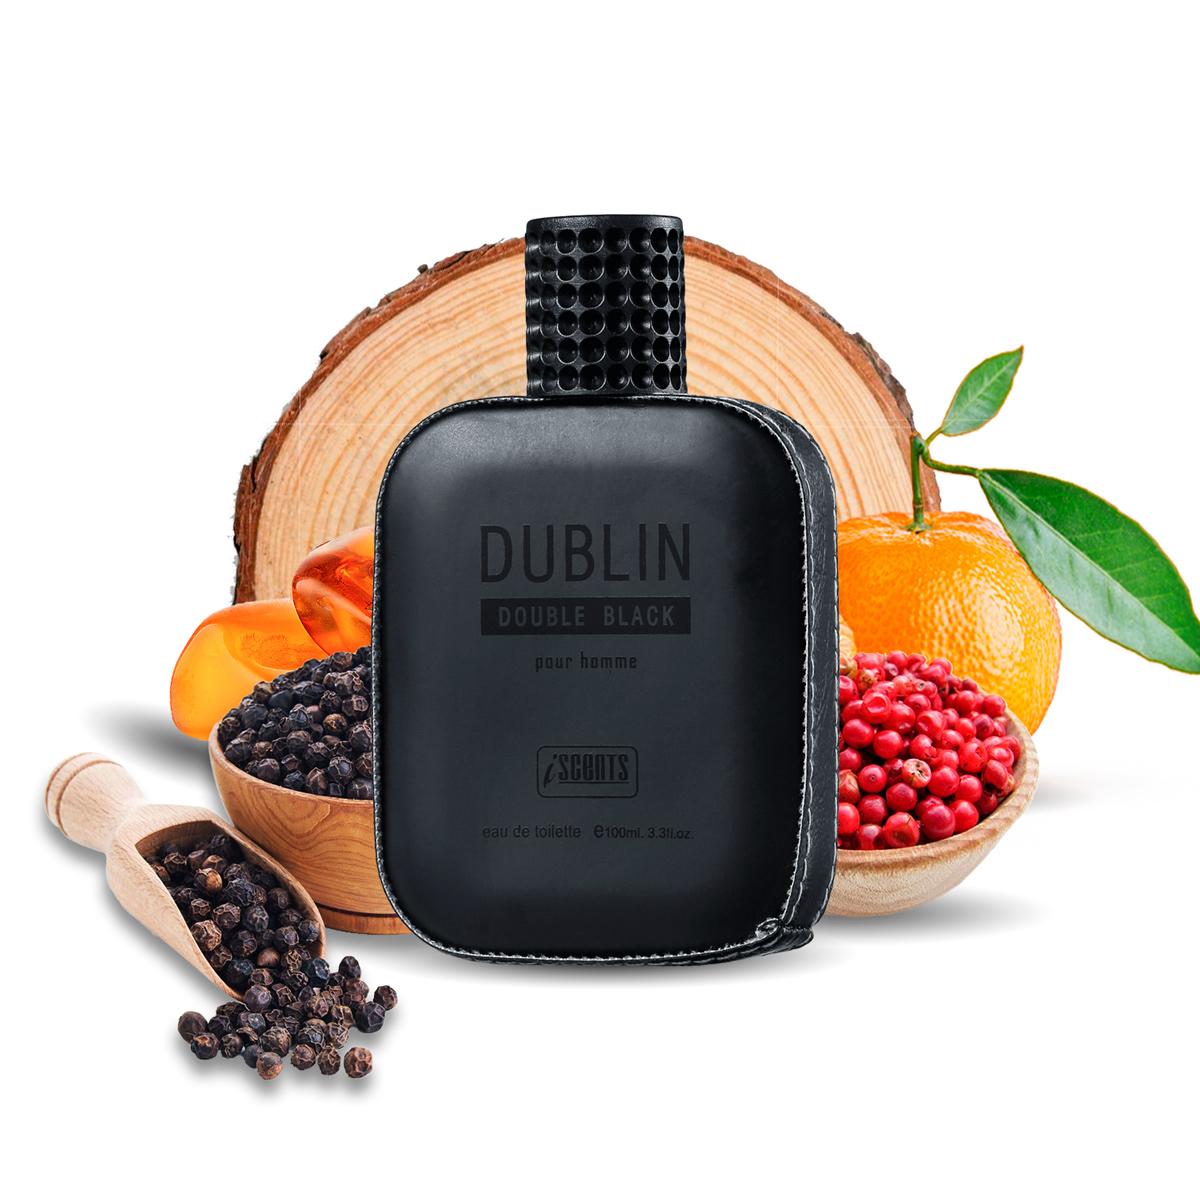 Kit 2 Perfumes Importados Coretan e Dublin I Scents